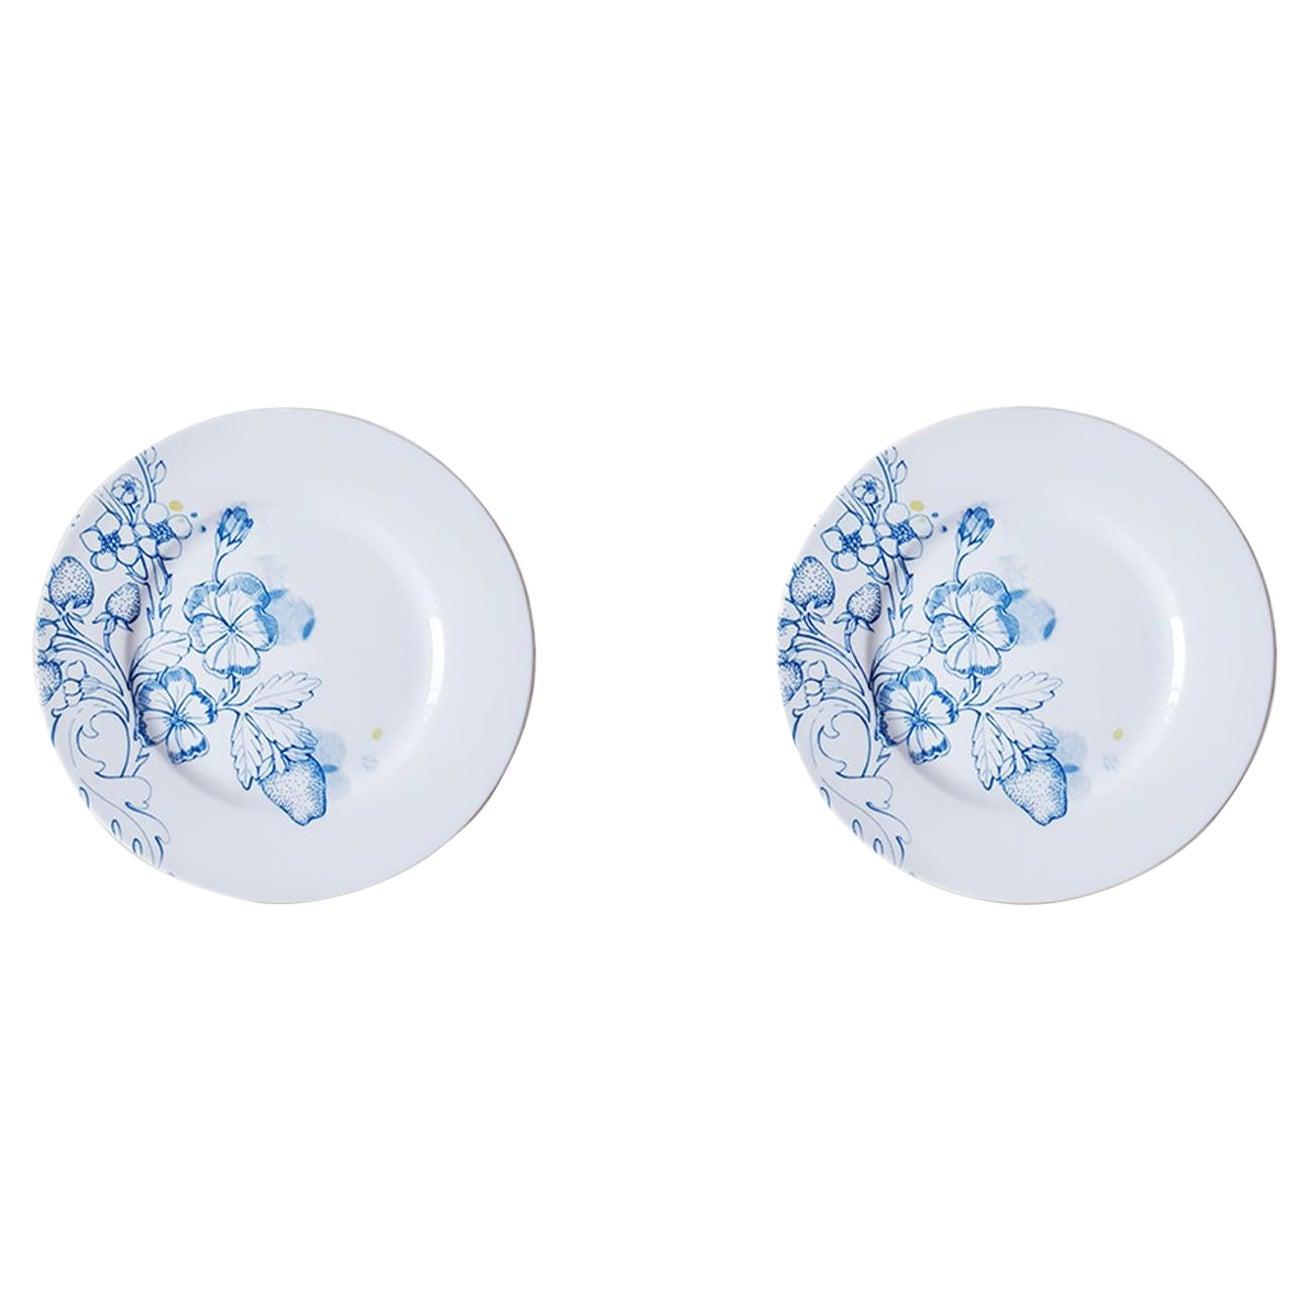 Blue Summer, Contemporary Porcelain Dessert Plates Set with Blue Floral Design